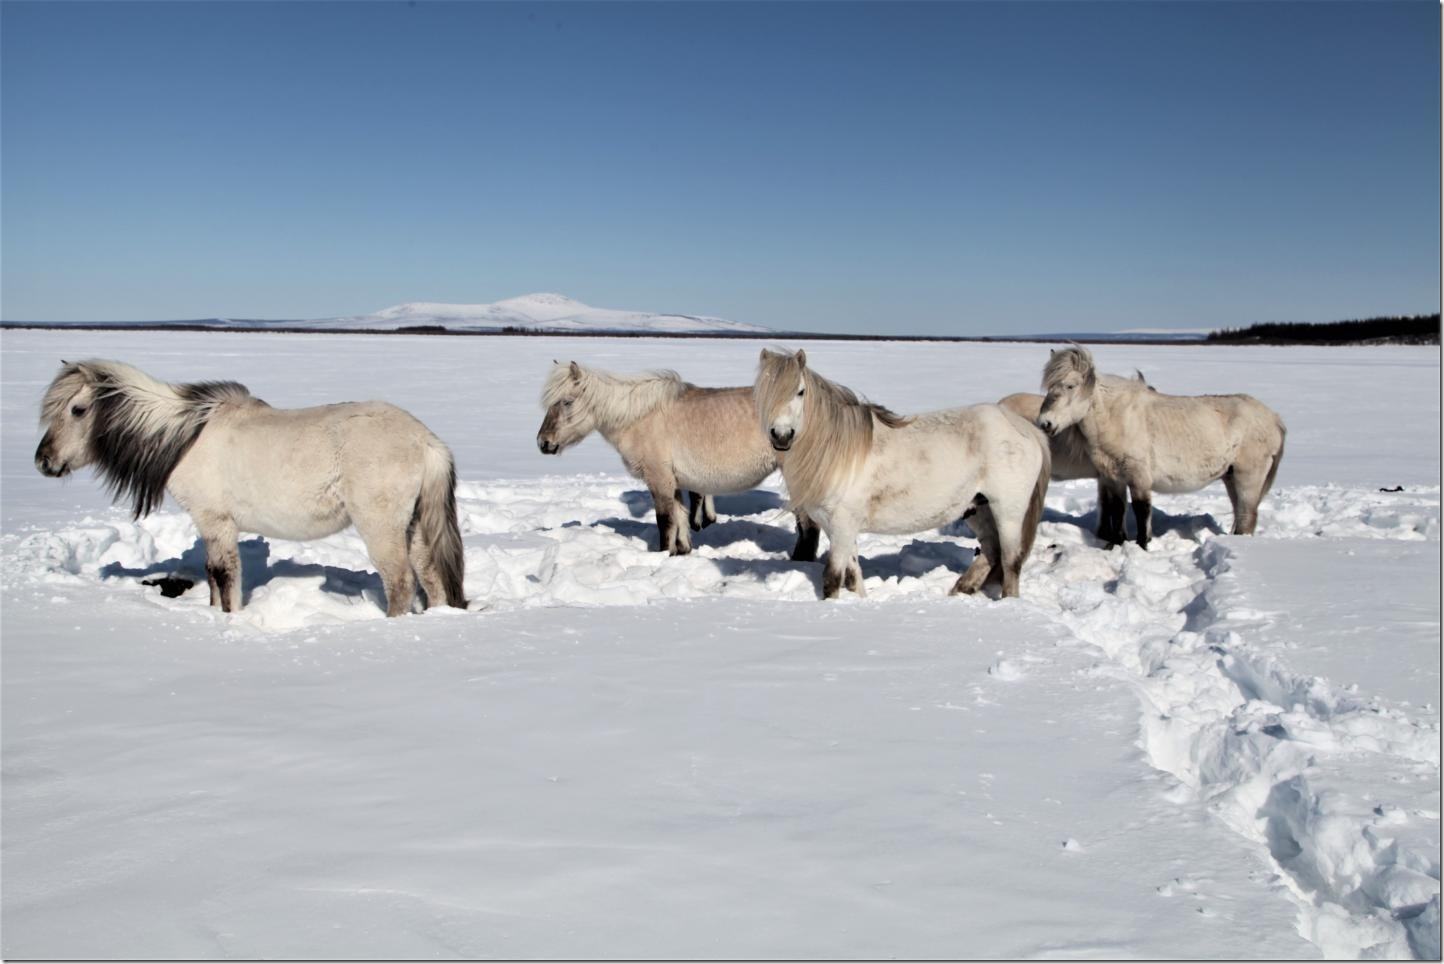 Herds of herbivores preserve the permafrost -- even under strong global warming. Credit: Pleistocene Park